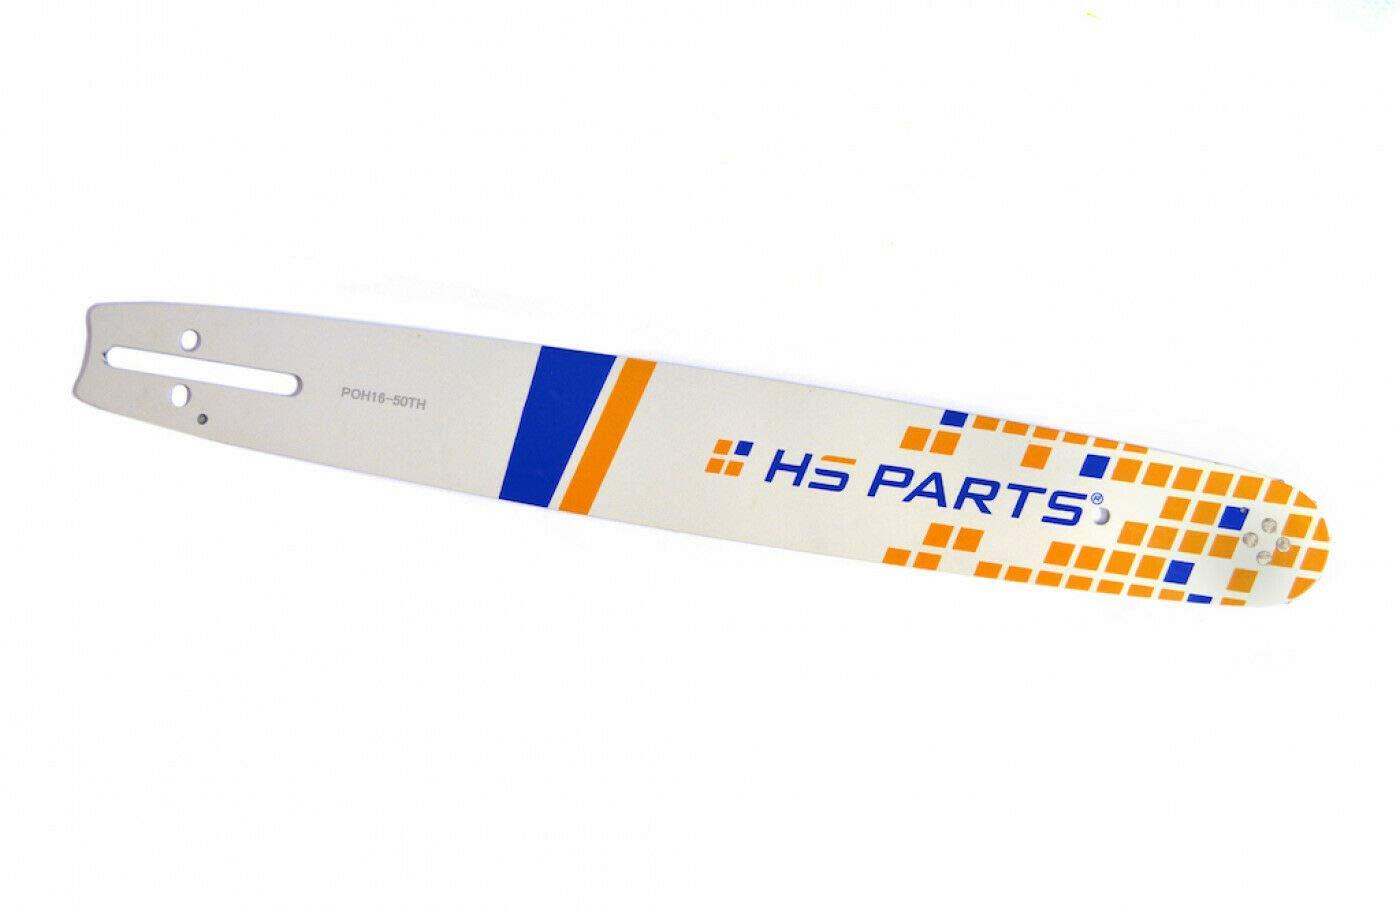 2x Ketten 66 Treibglieder .325 1,3 mm f/ür Husqvarna Dolmar Efco Homelite Jonsered Oleo-Mac Olympik Partner Pioneer Zenoah Solo HS PARTS Schwert 40 cm